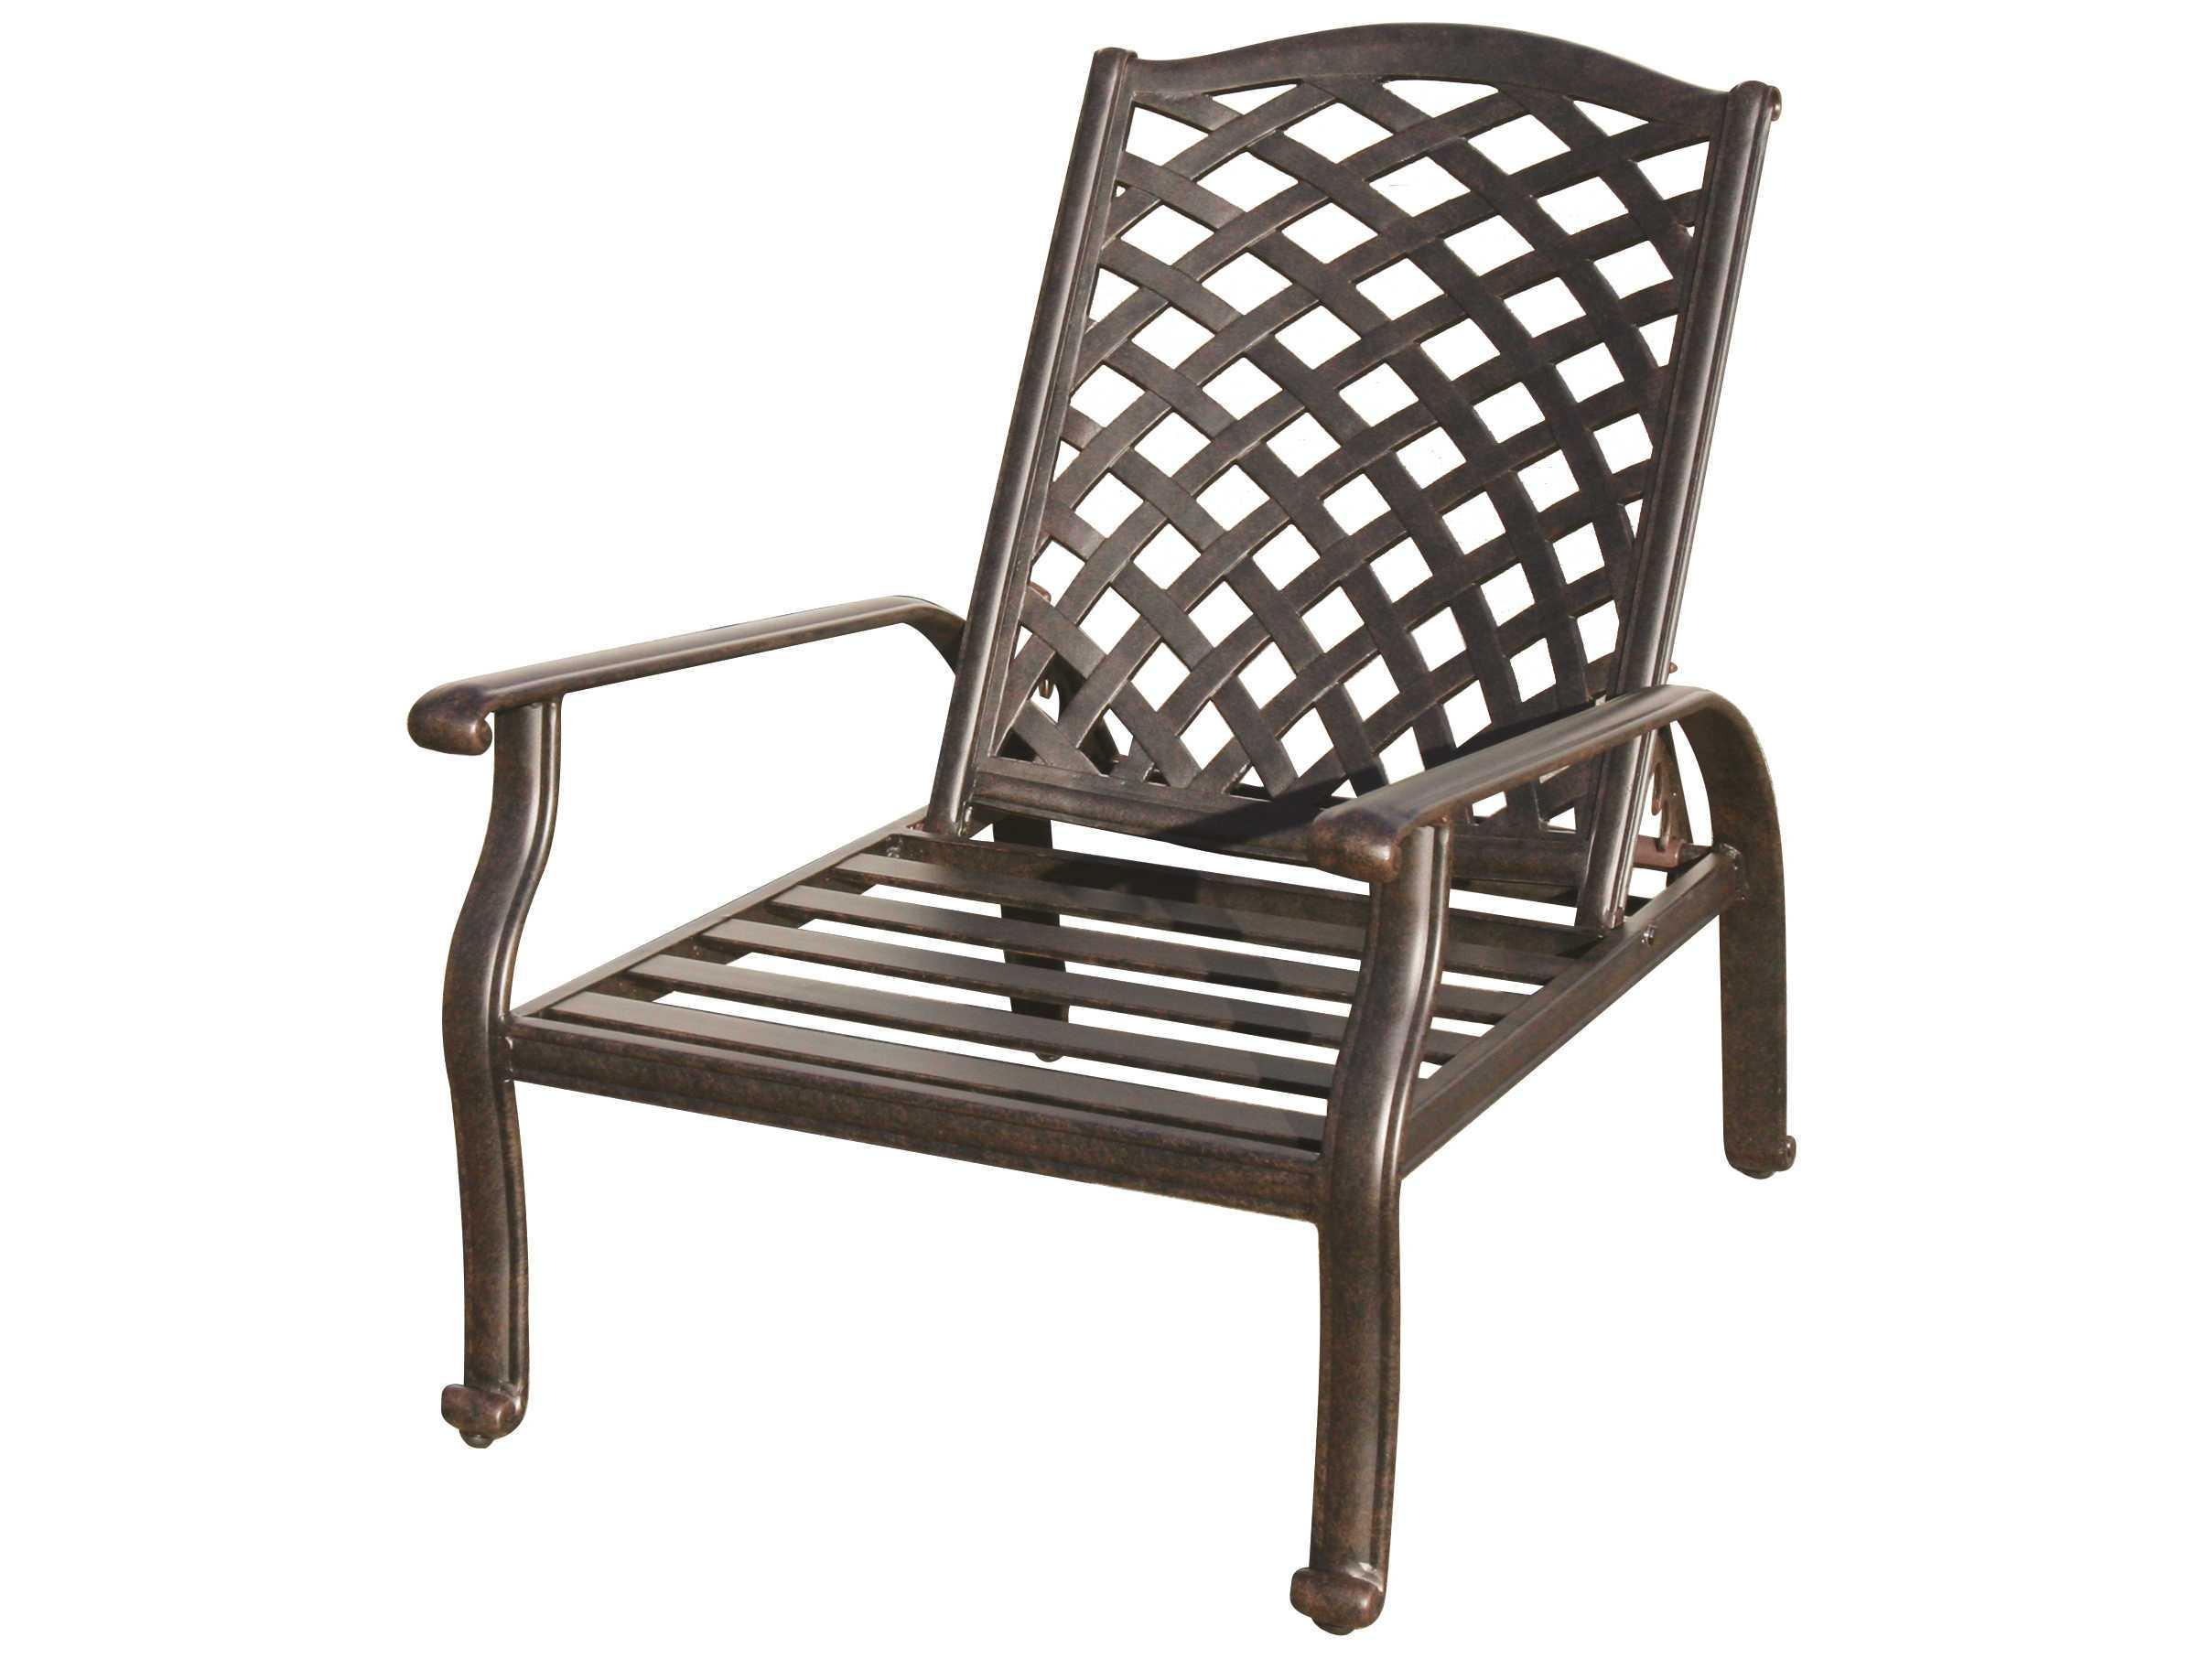 darlee outdoor living nassau cast aluminum antique bronze adjustable club chair